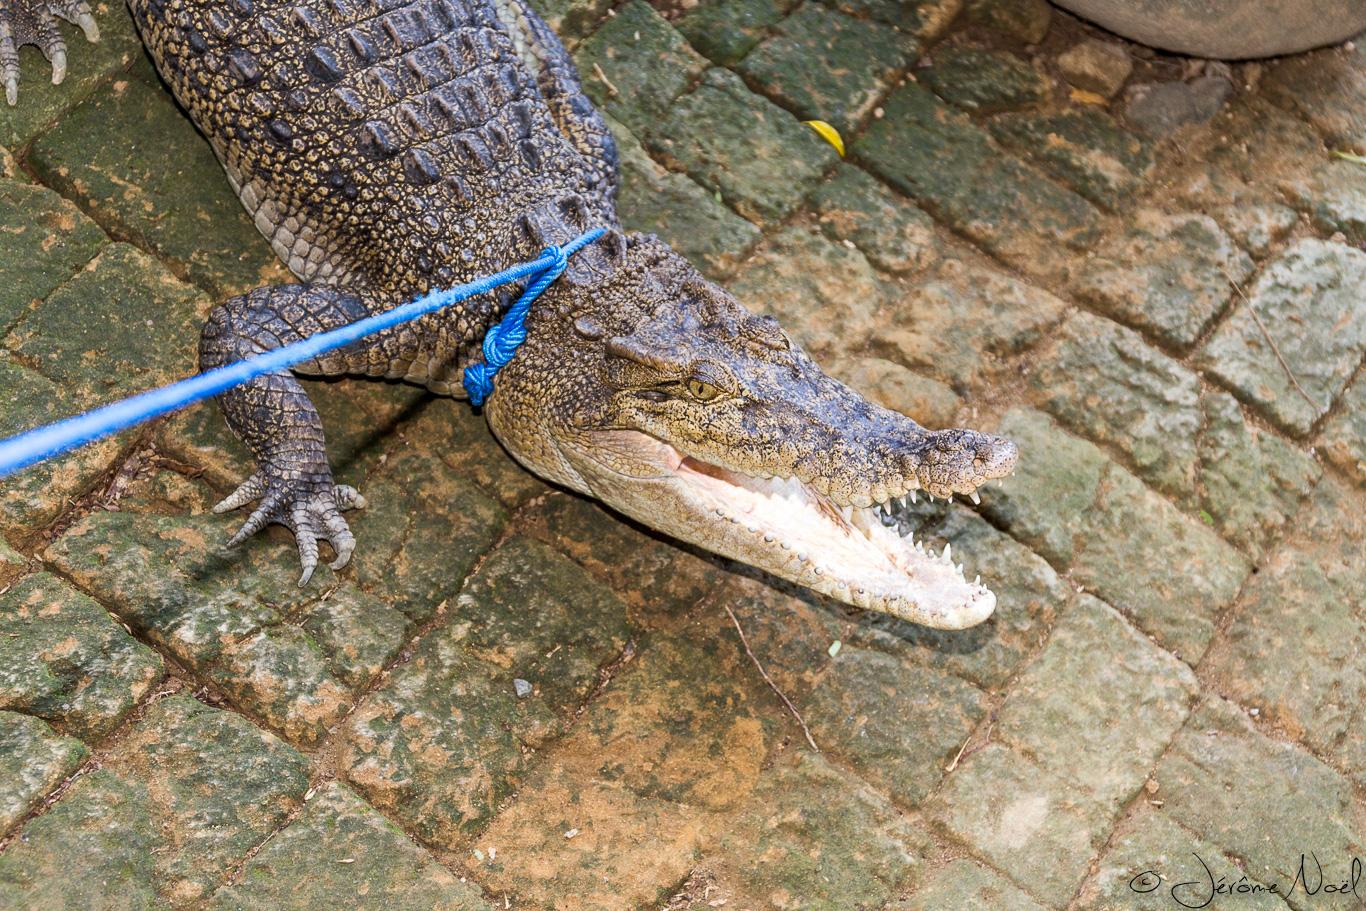 Bali Reptile Park - alligator